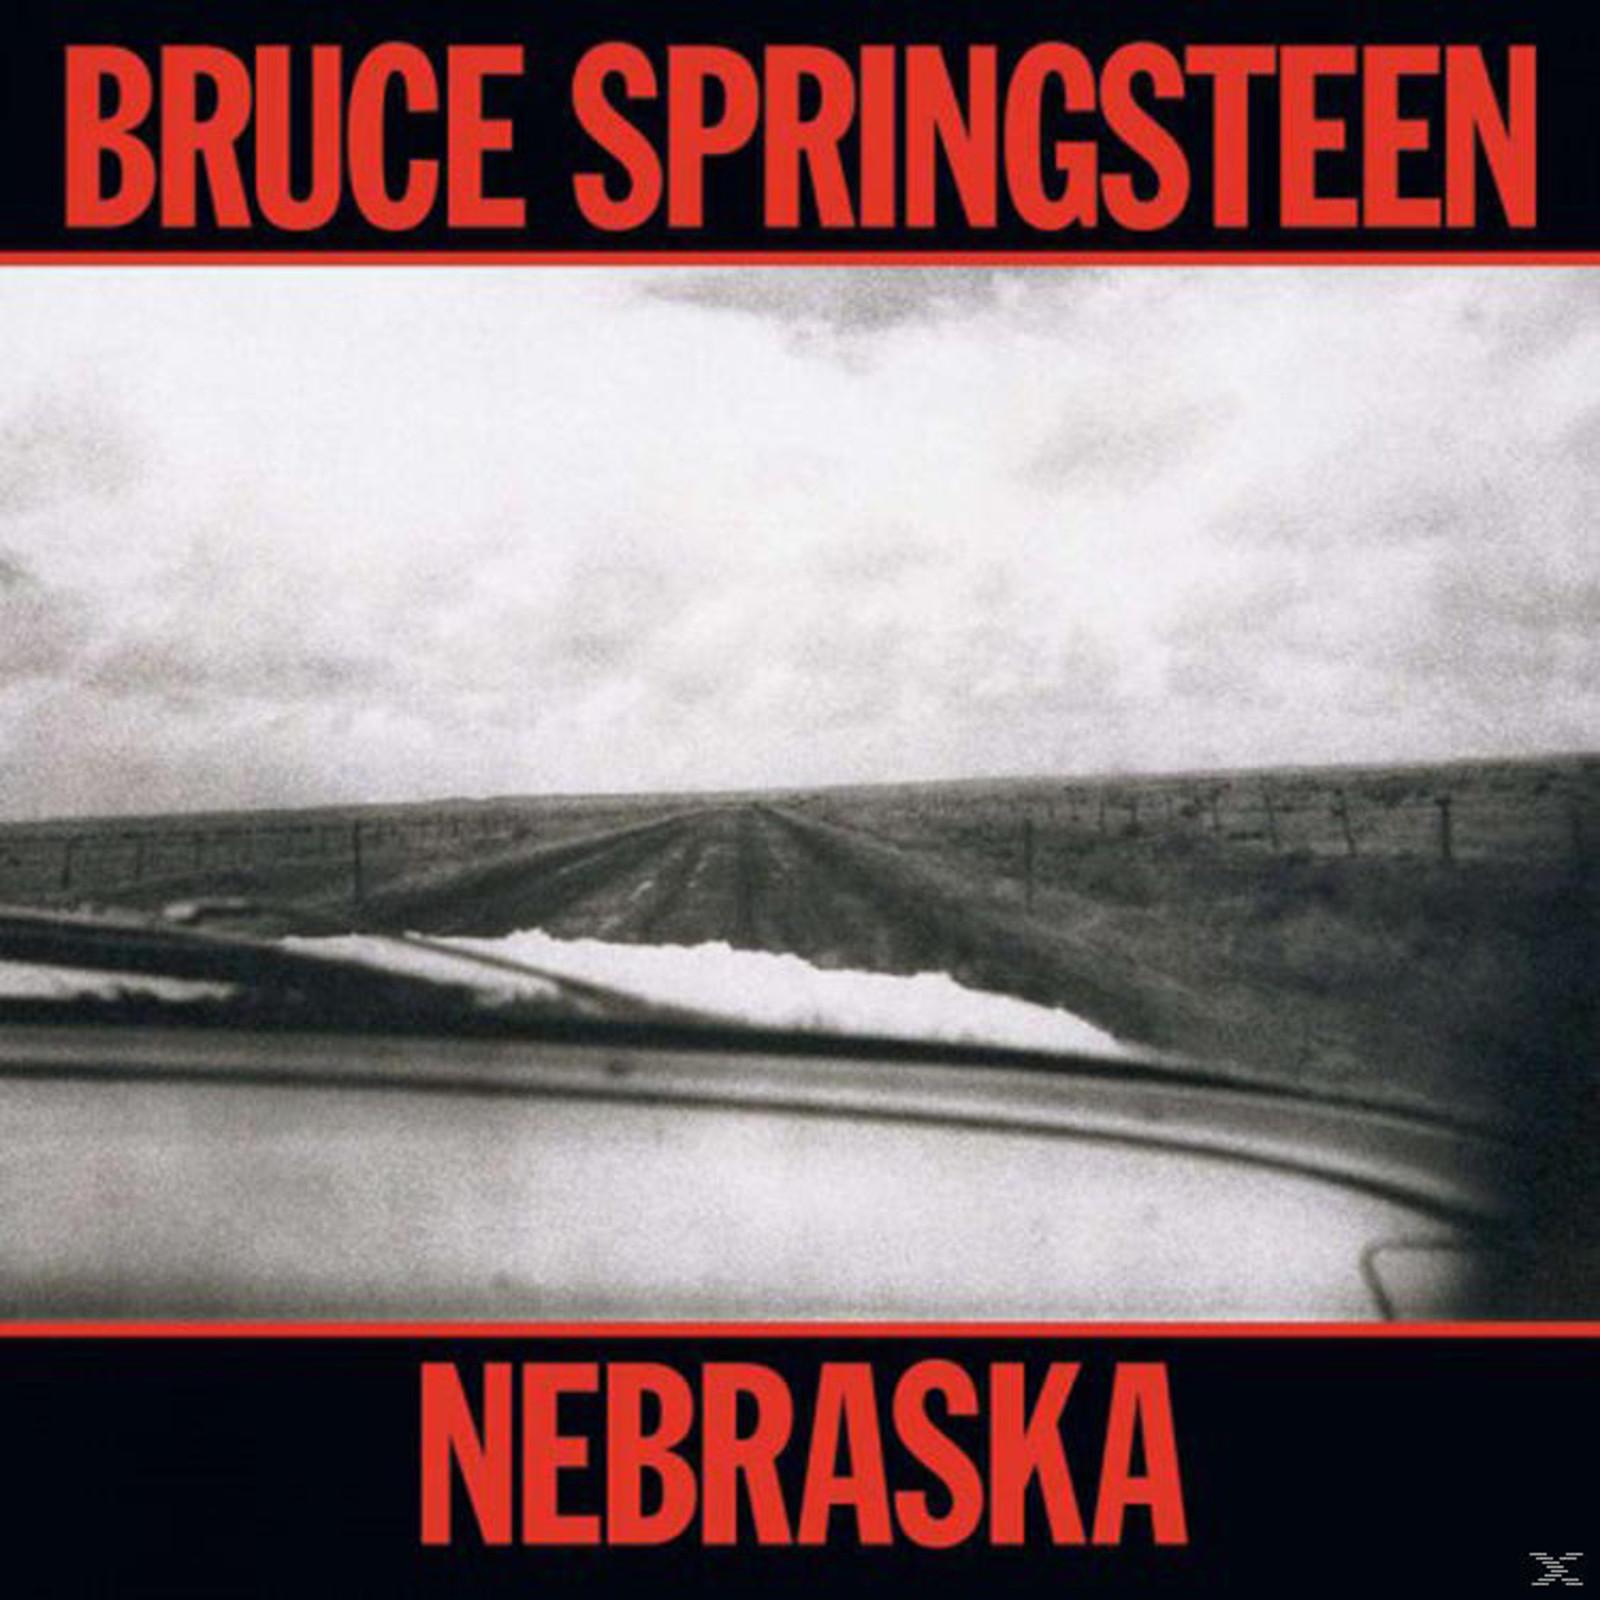 Bruce Springsteen - Nebraska - (CD)